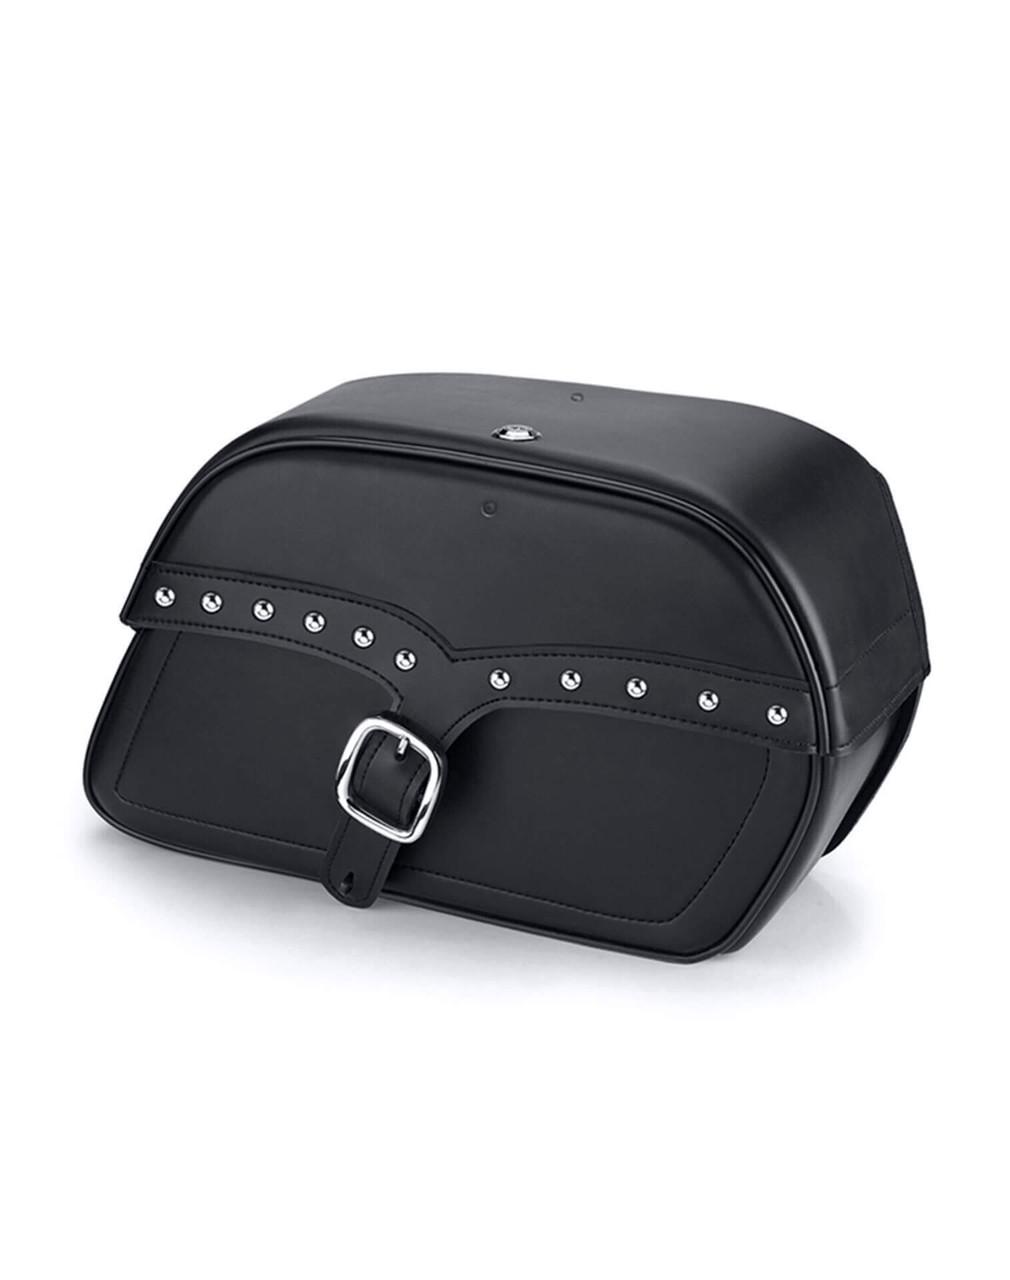 Suzuki Intruder 1500 VL1500 Charger Single Strap Studded Medium Motorcycle Saddlebags Main Bag View